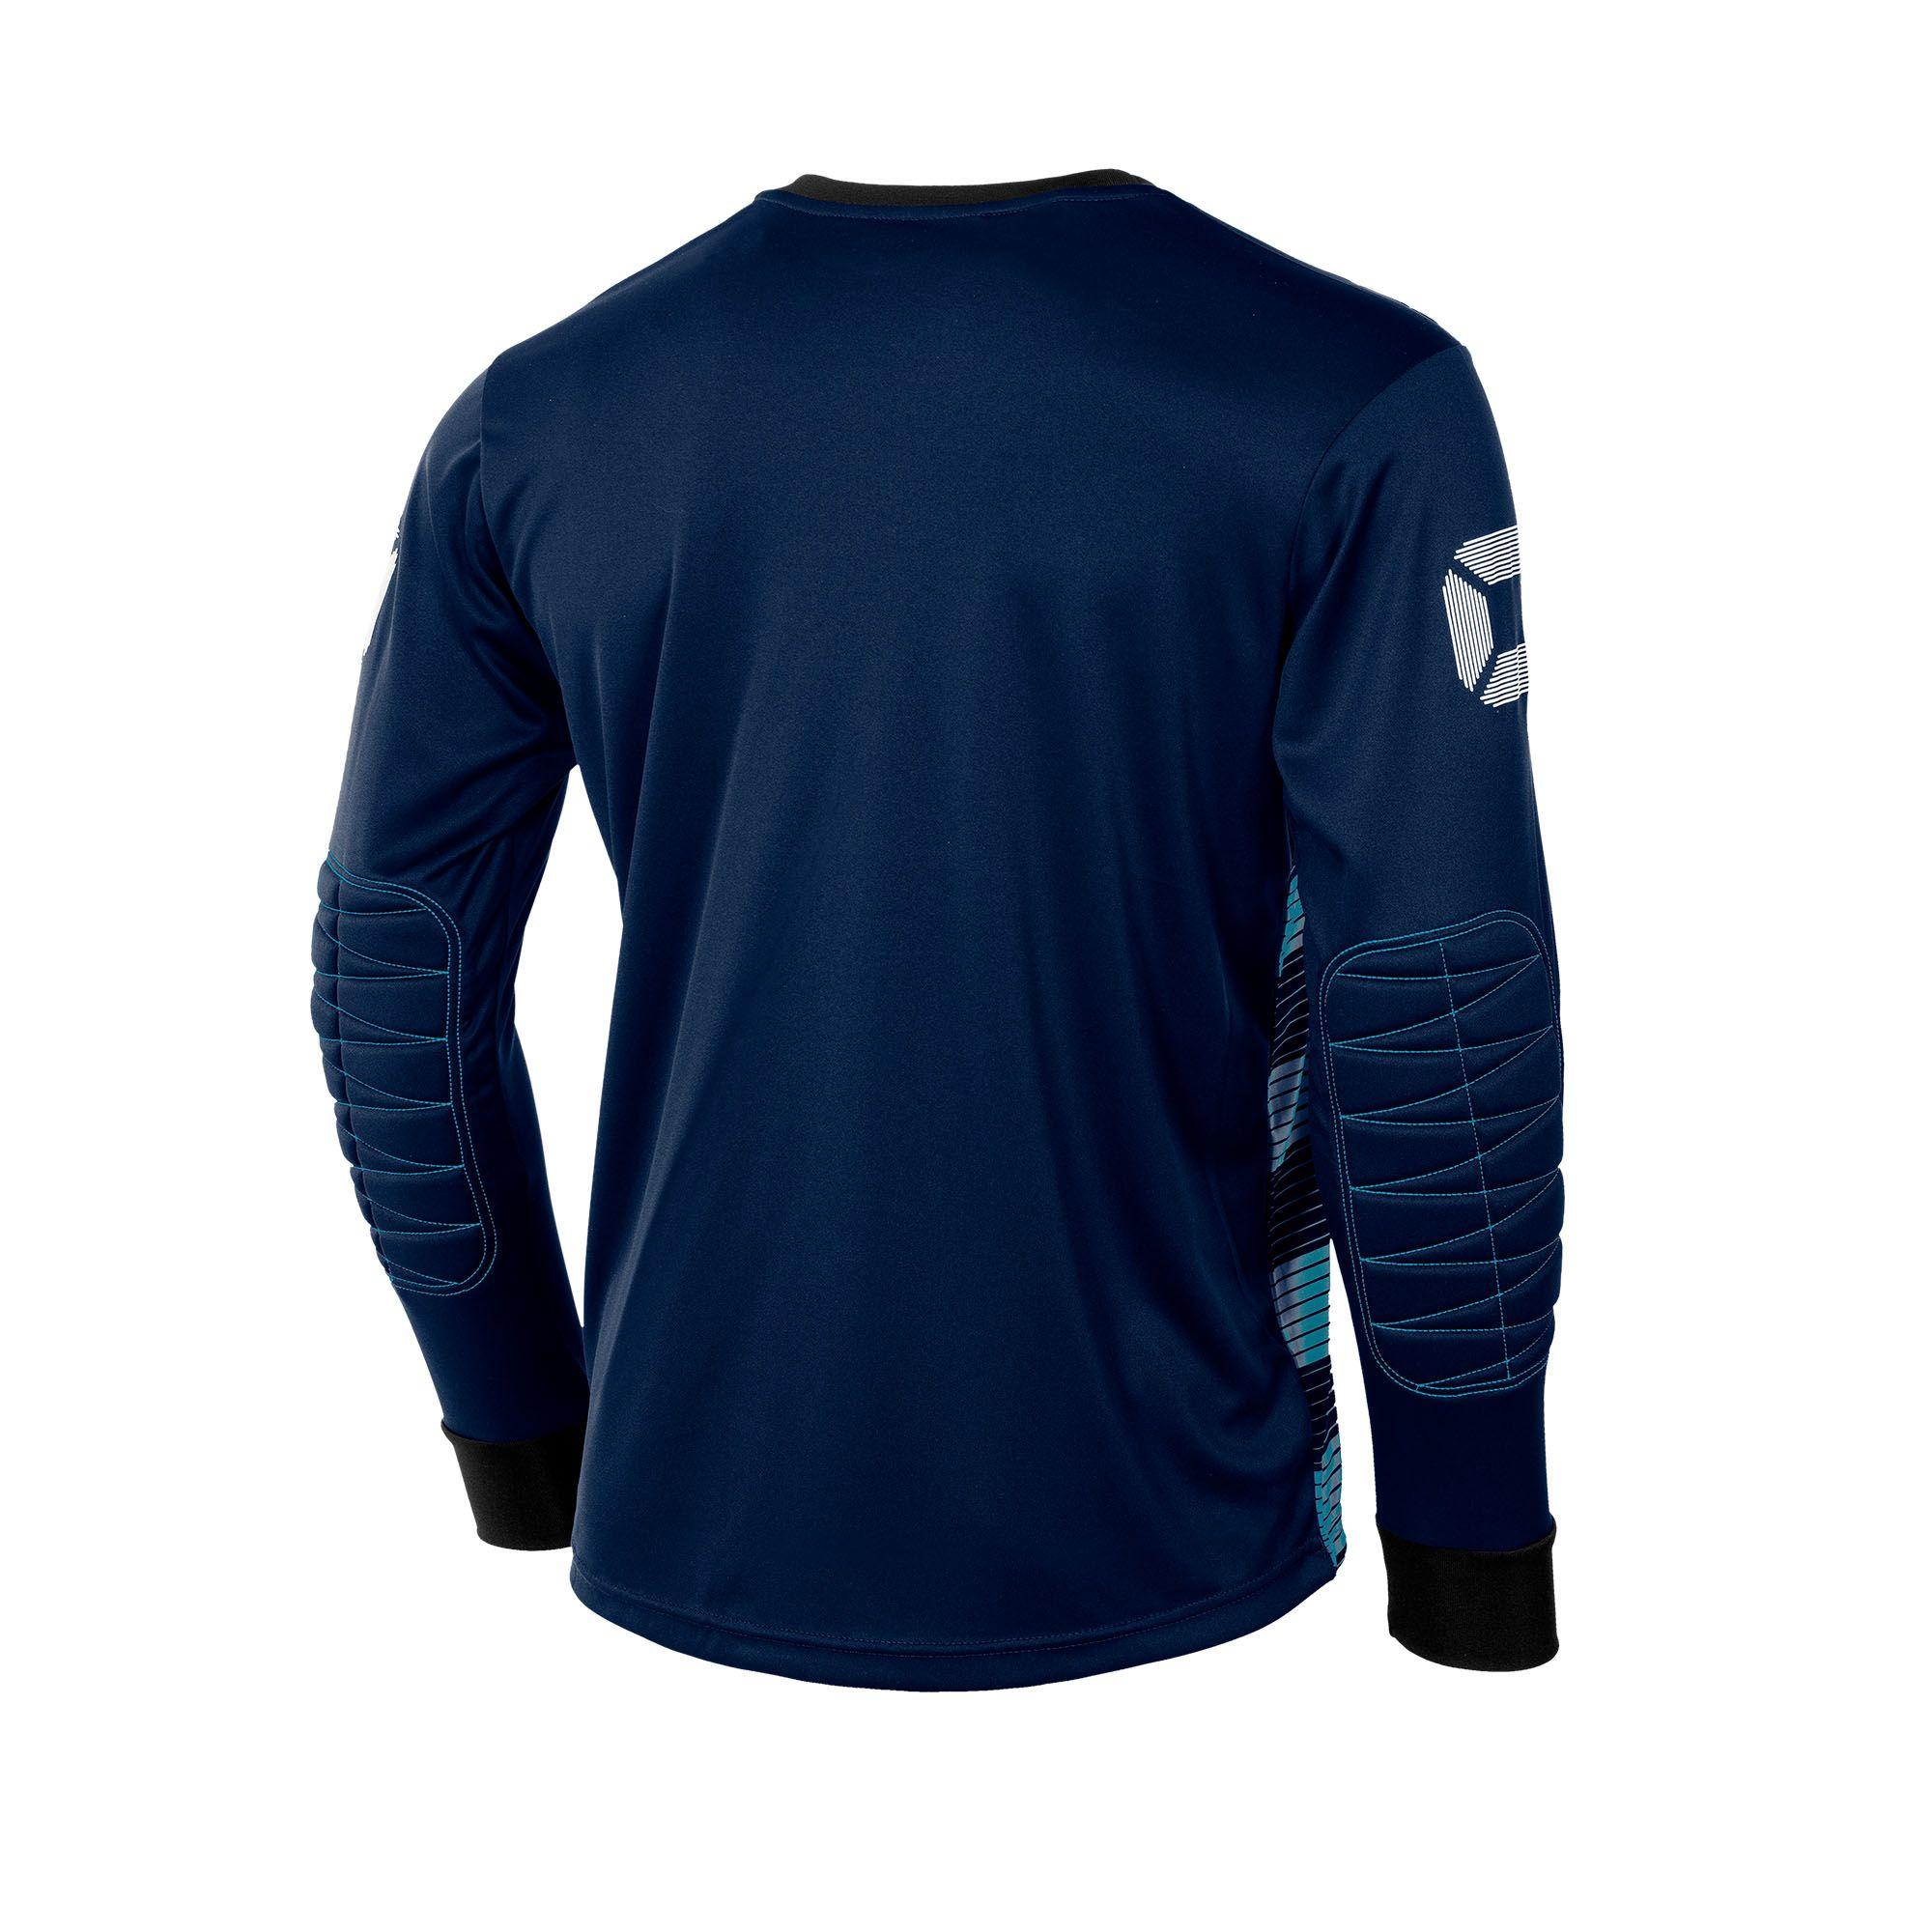 265f9d38a52 Tivoli Goalkeeper Shirt-415001-7800-128--Stanno.com